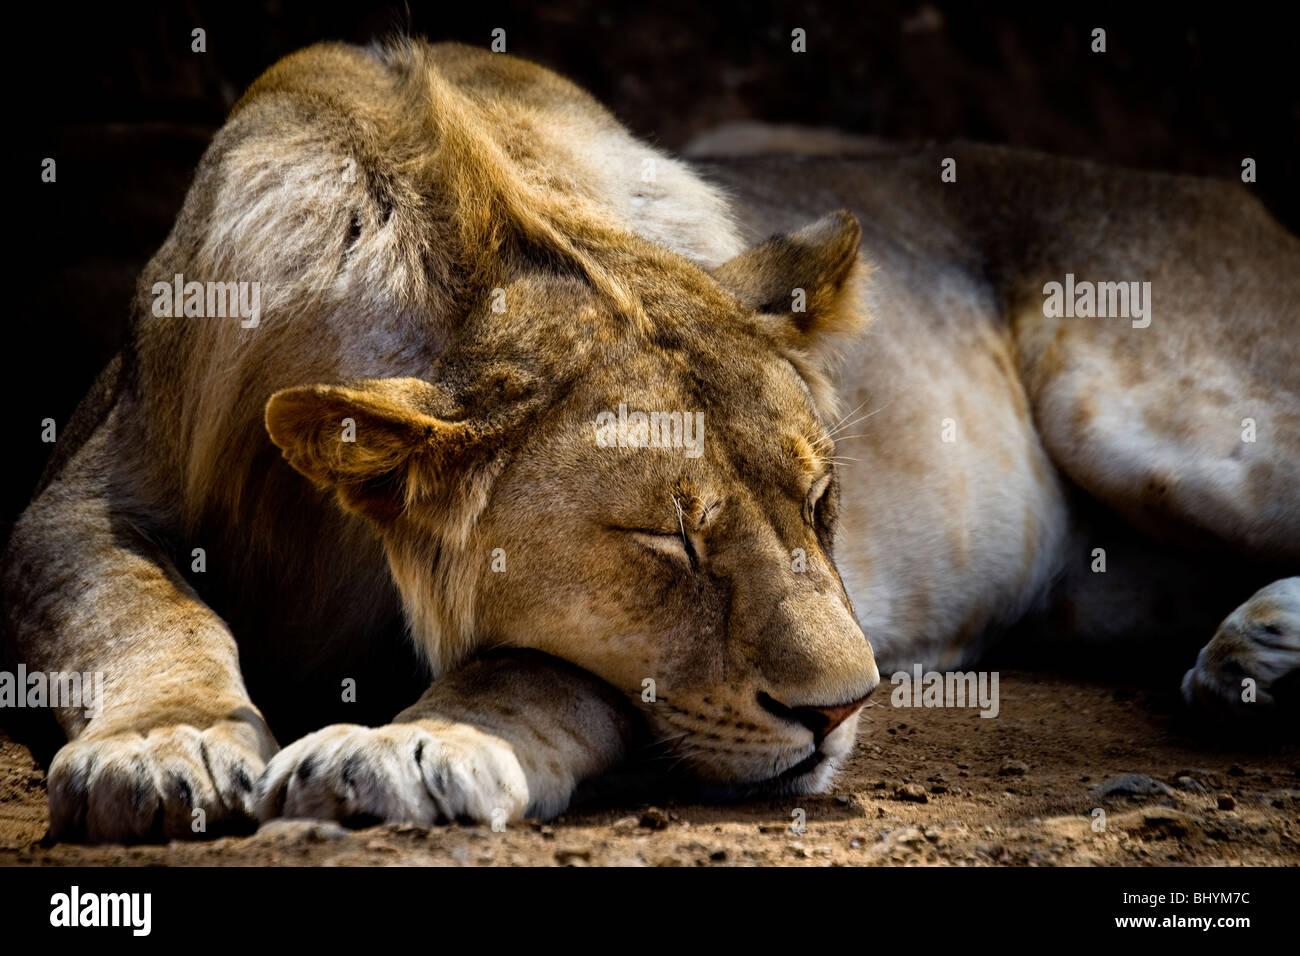 Young male lion sleeping, Serengeti NP, Tanzania, East Africa - Stock Image